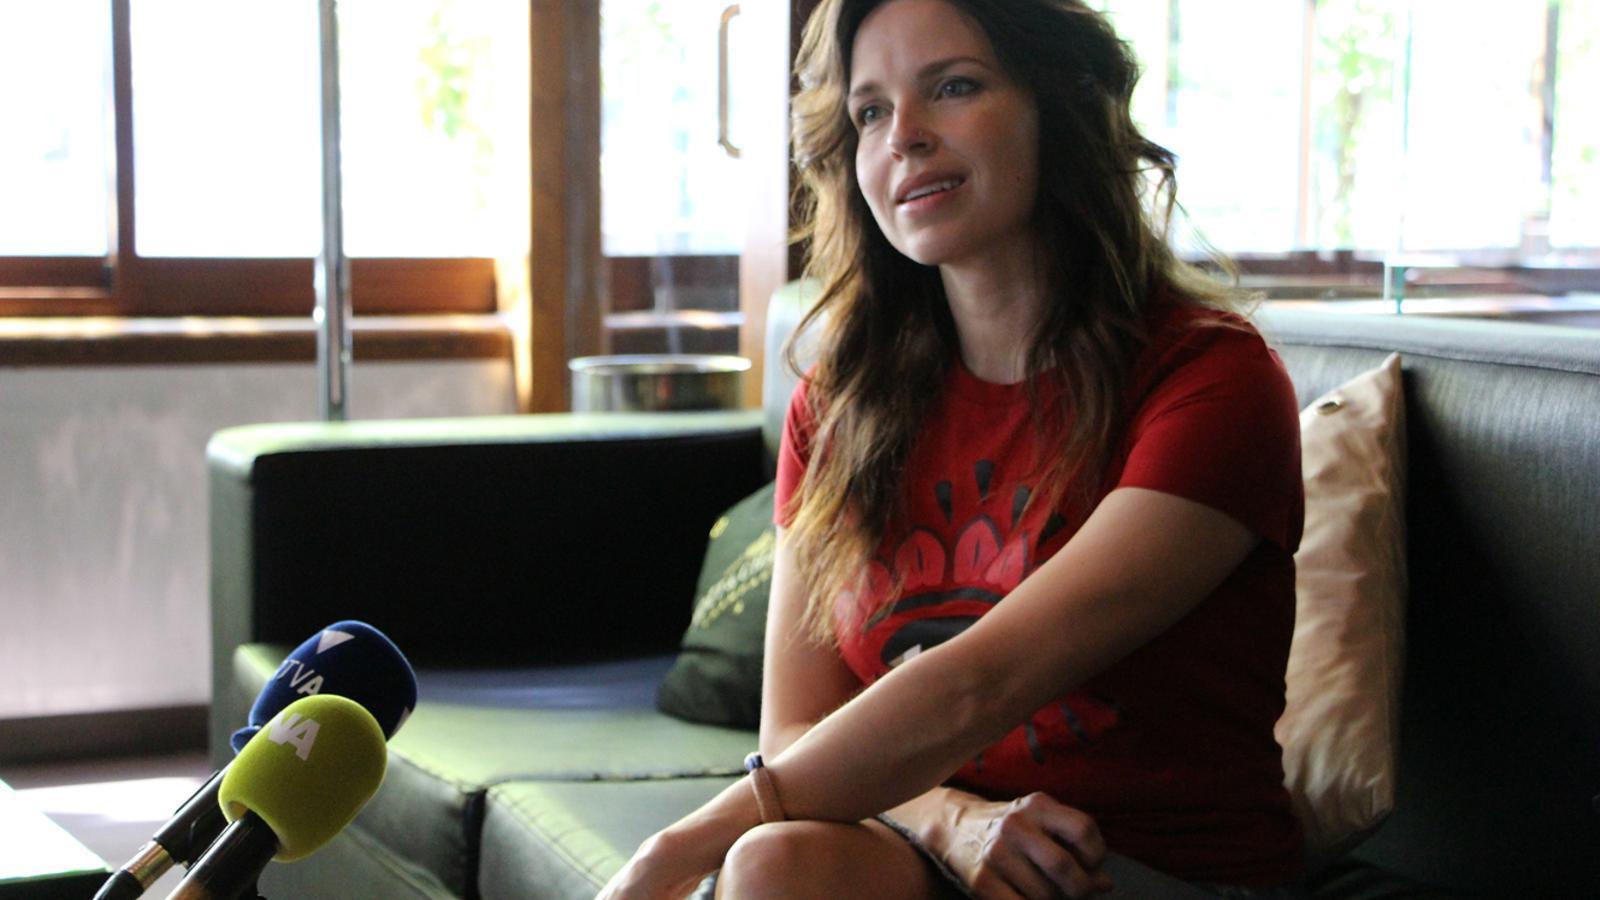 La directora creativa de 'Rebel', Lydia Bouchard. / T. N. (ANA)